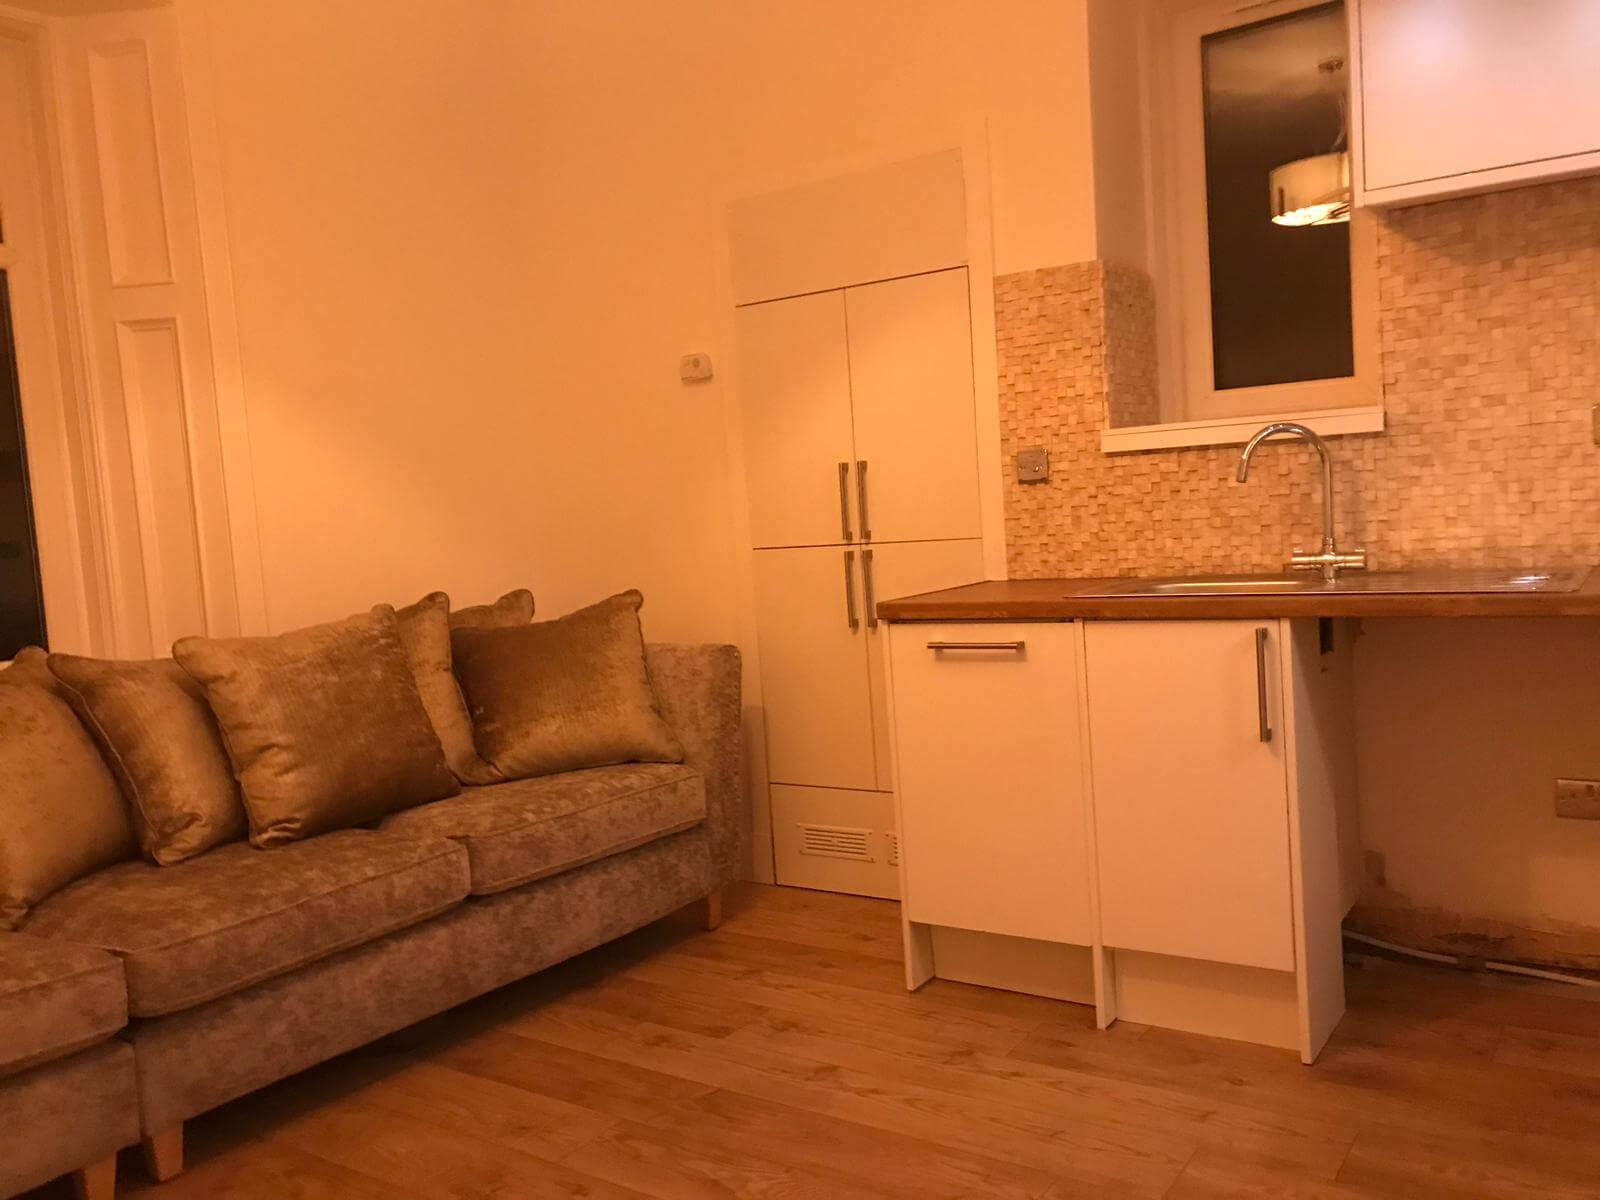 kitchen remodelling by FIX LTD, Glasgow